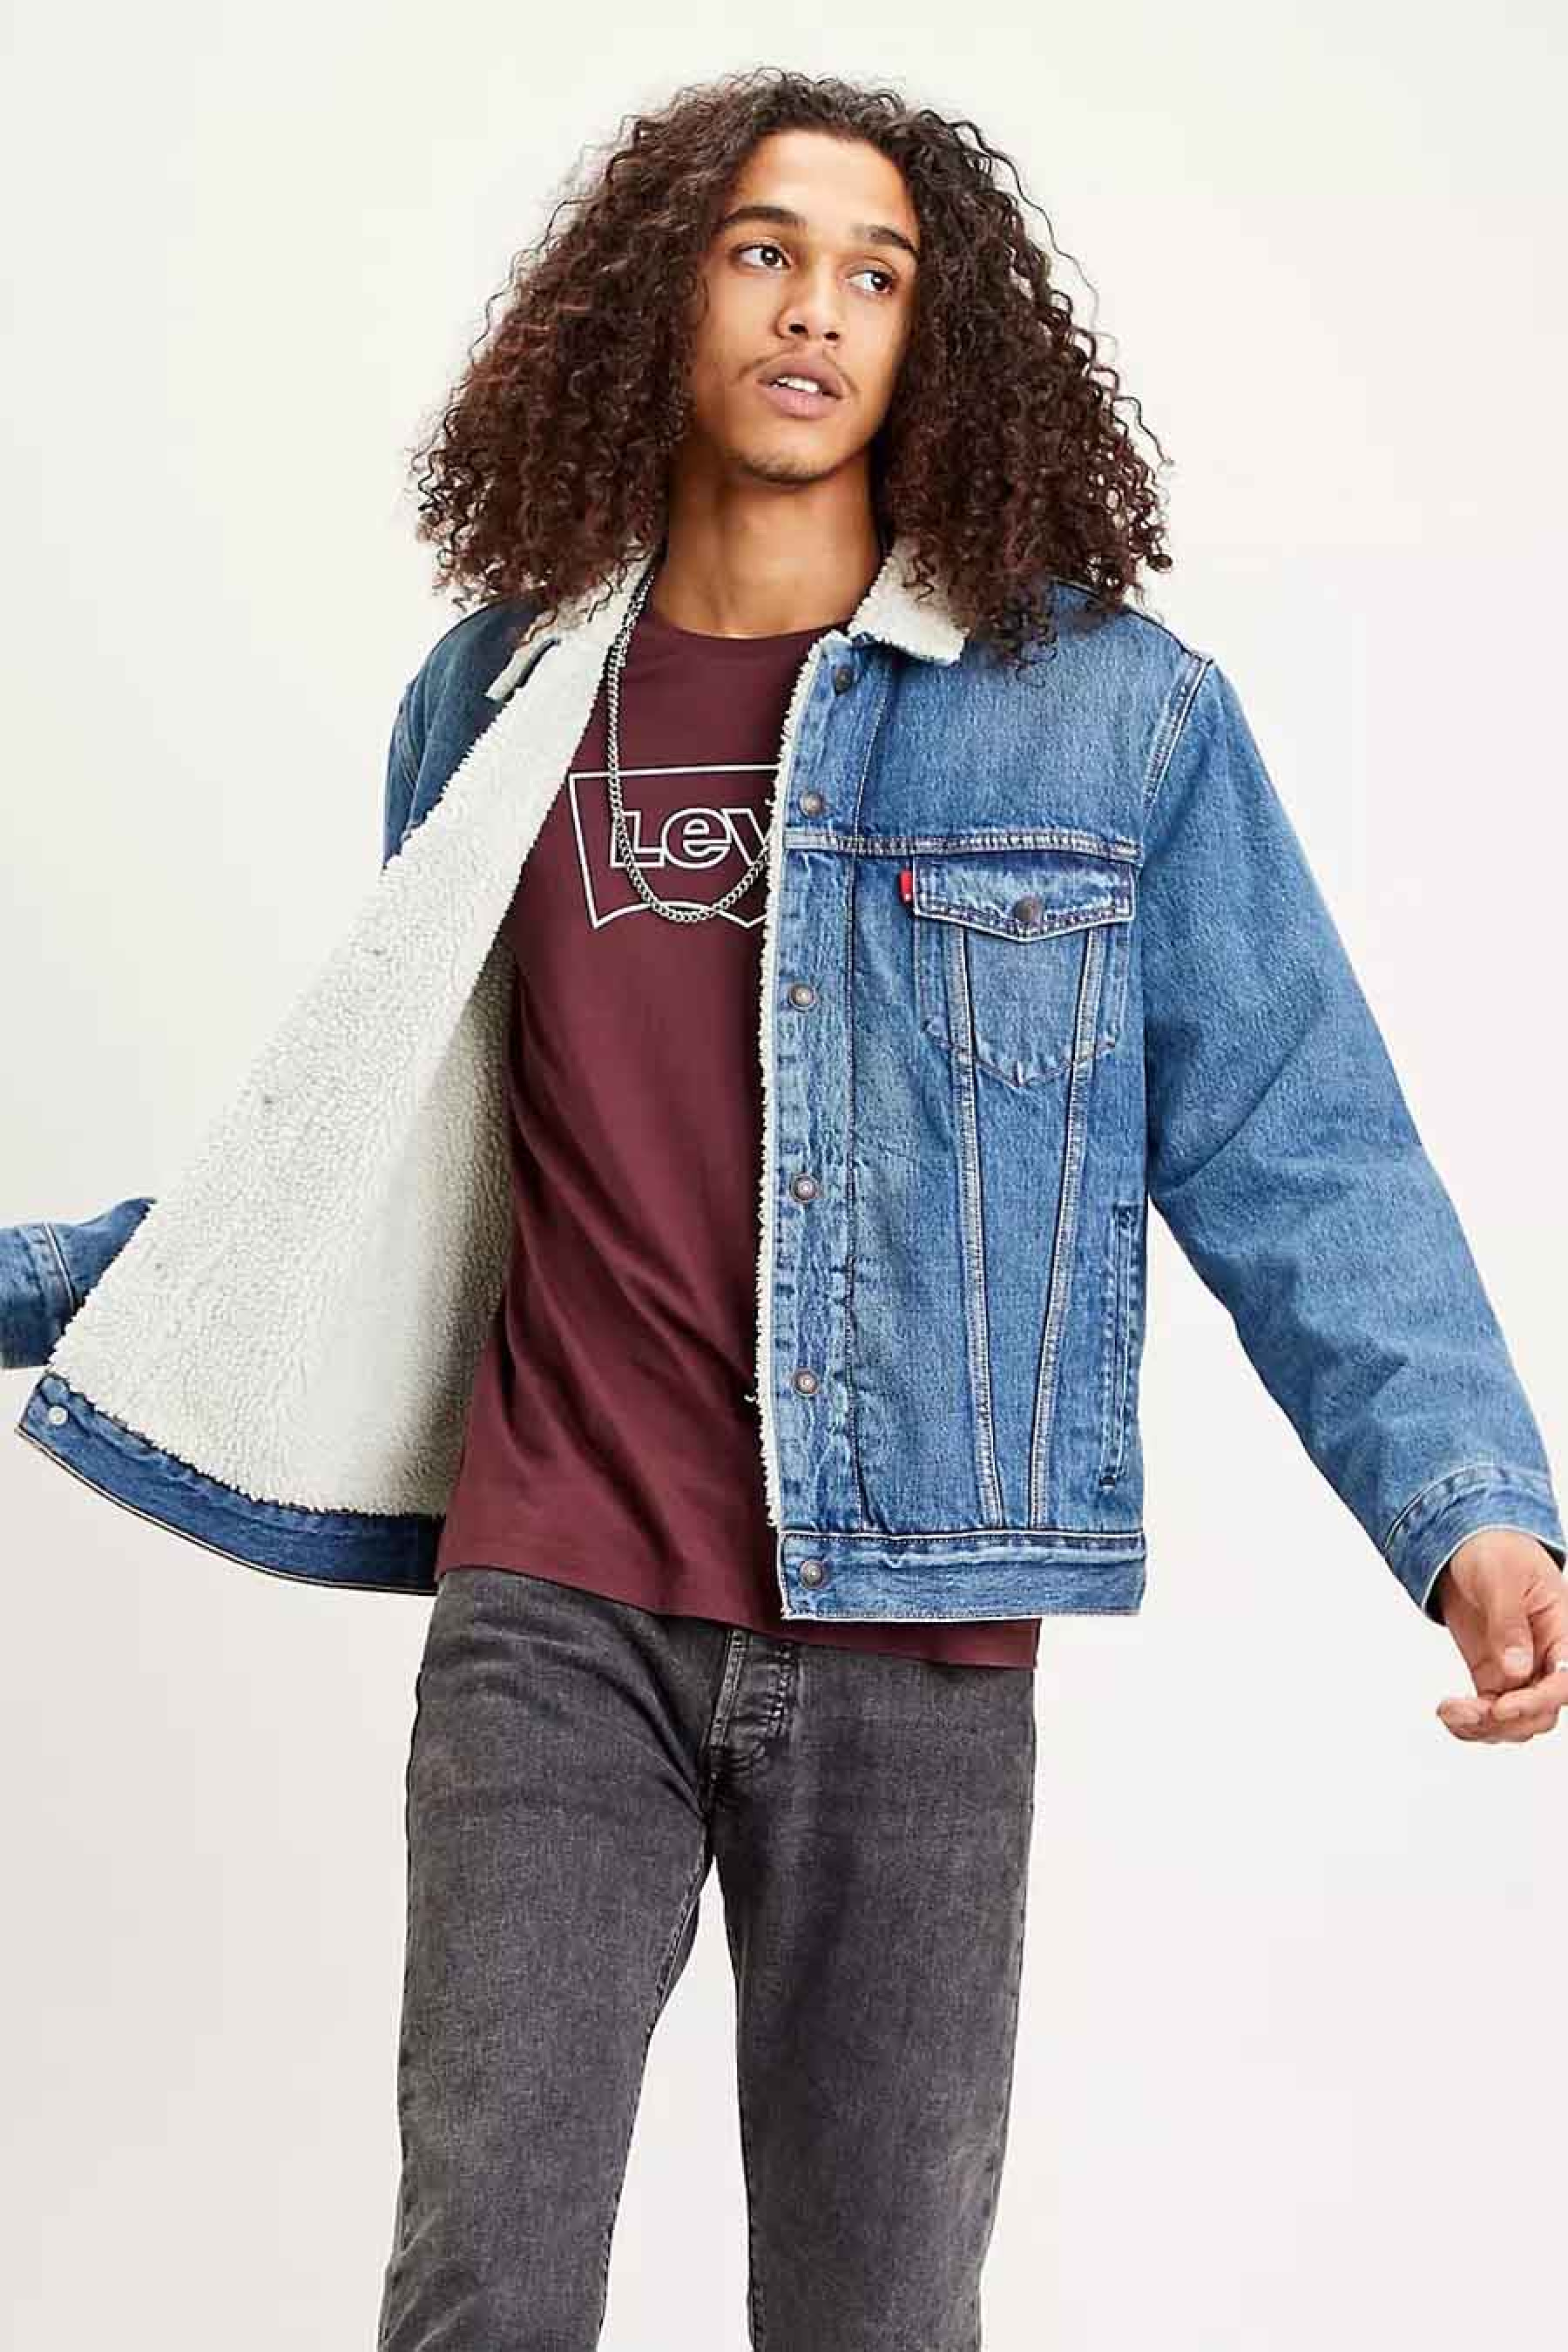 Levi's® Jas jeans, Denim, Heren, Maat: L/M/S/XL